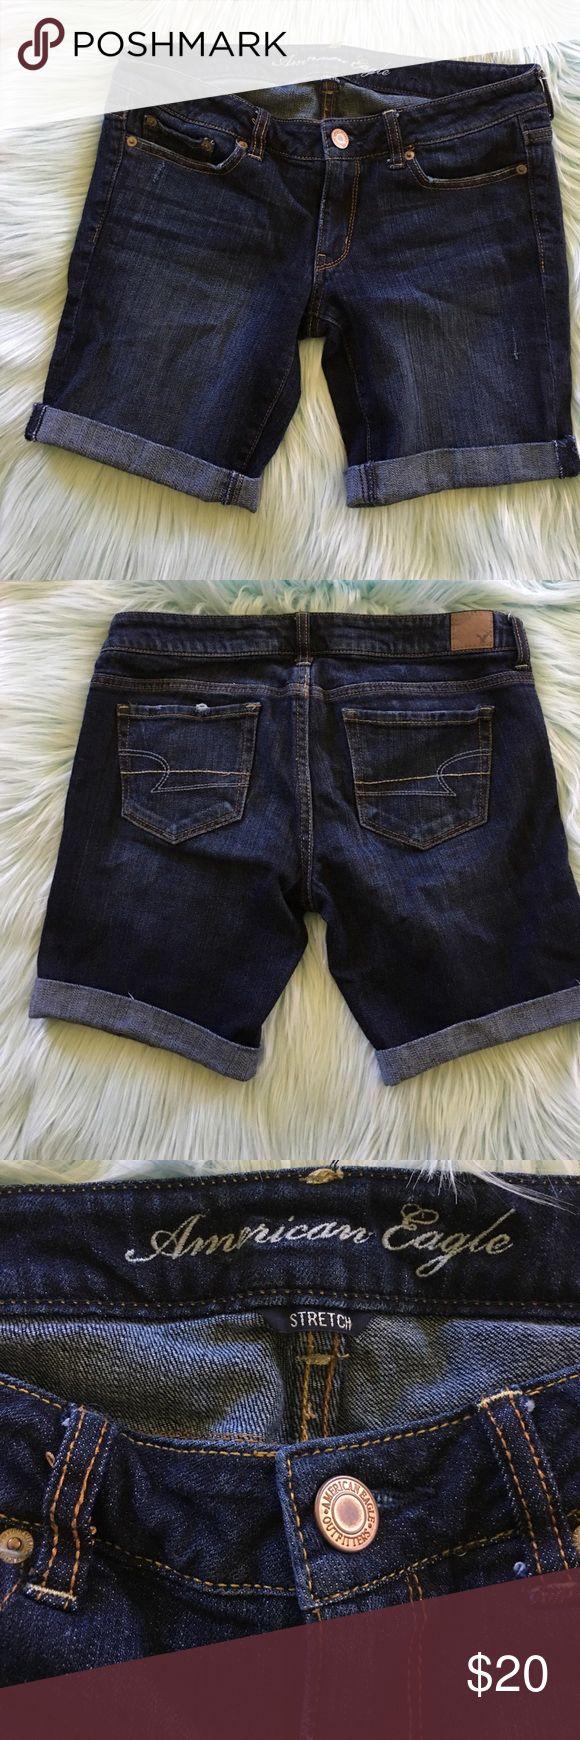 American Eagle size 6 stretch cut off jeans shorts American Eagle size 6 stretch cut off jeans shorts American Eagle Outfitters Shorts Jean Shorts